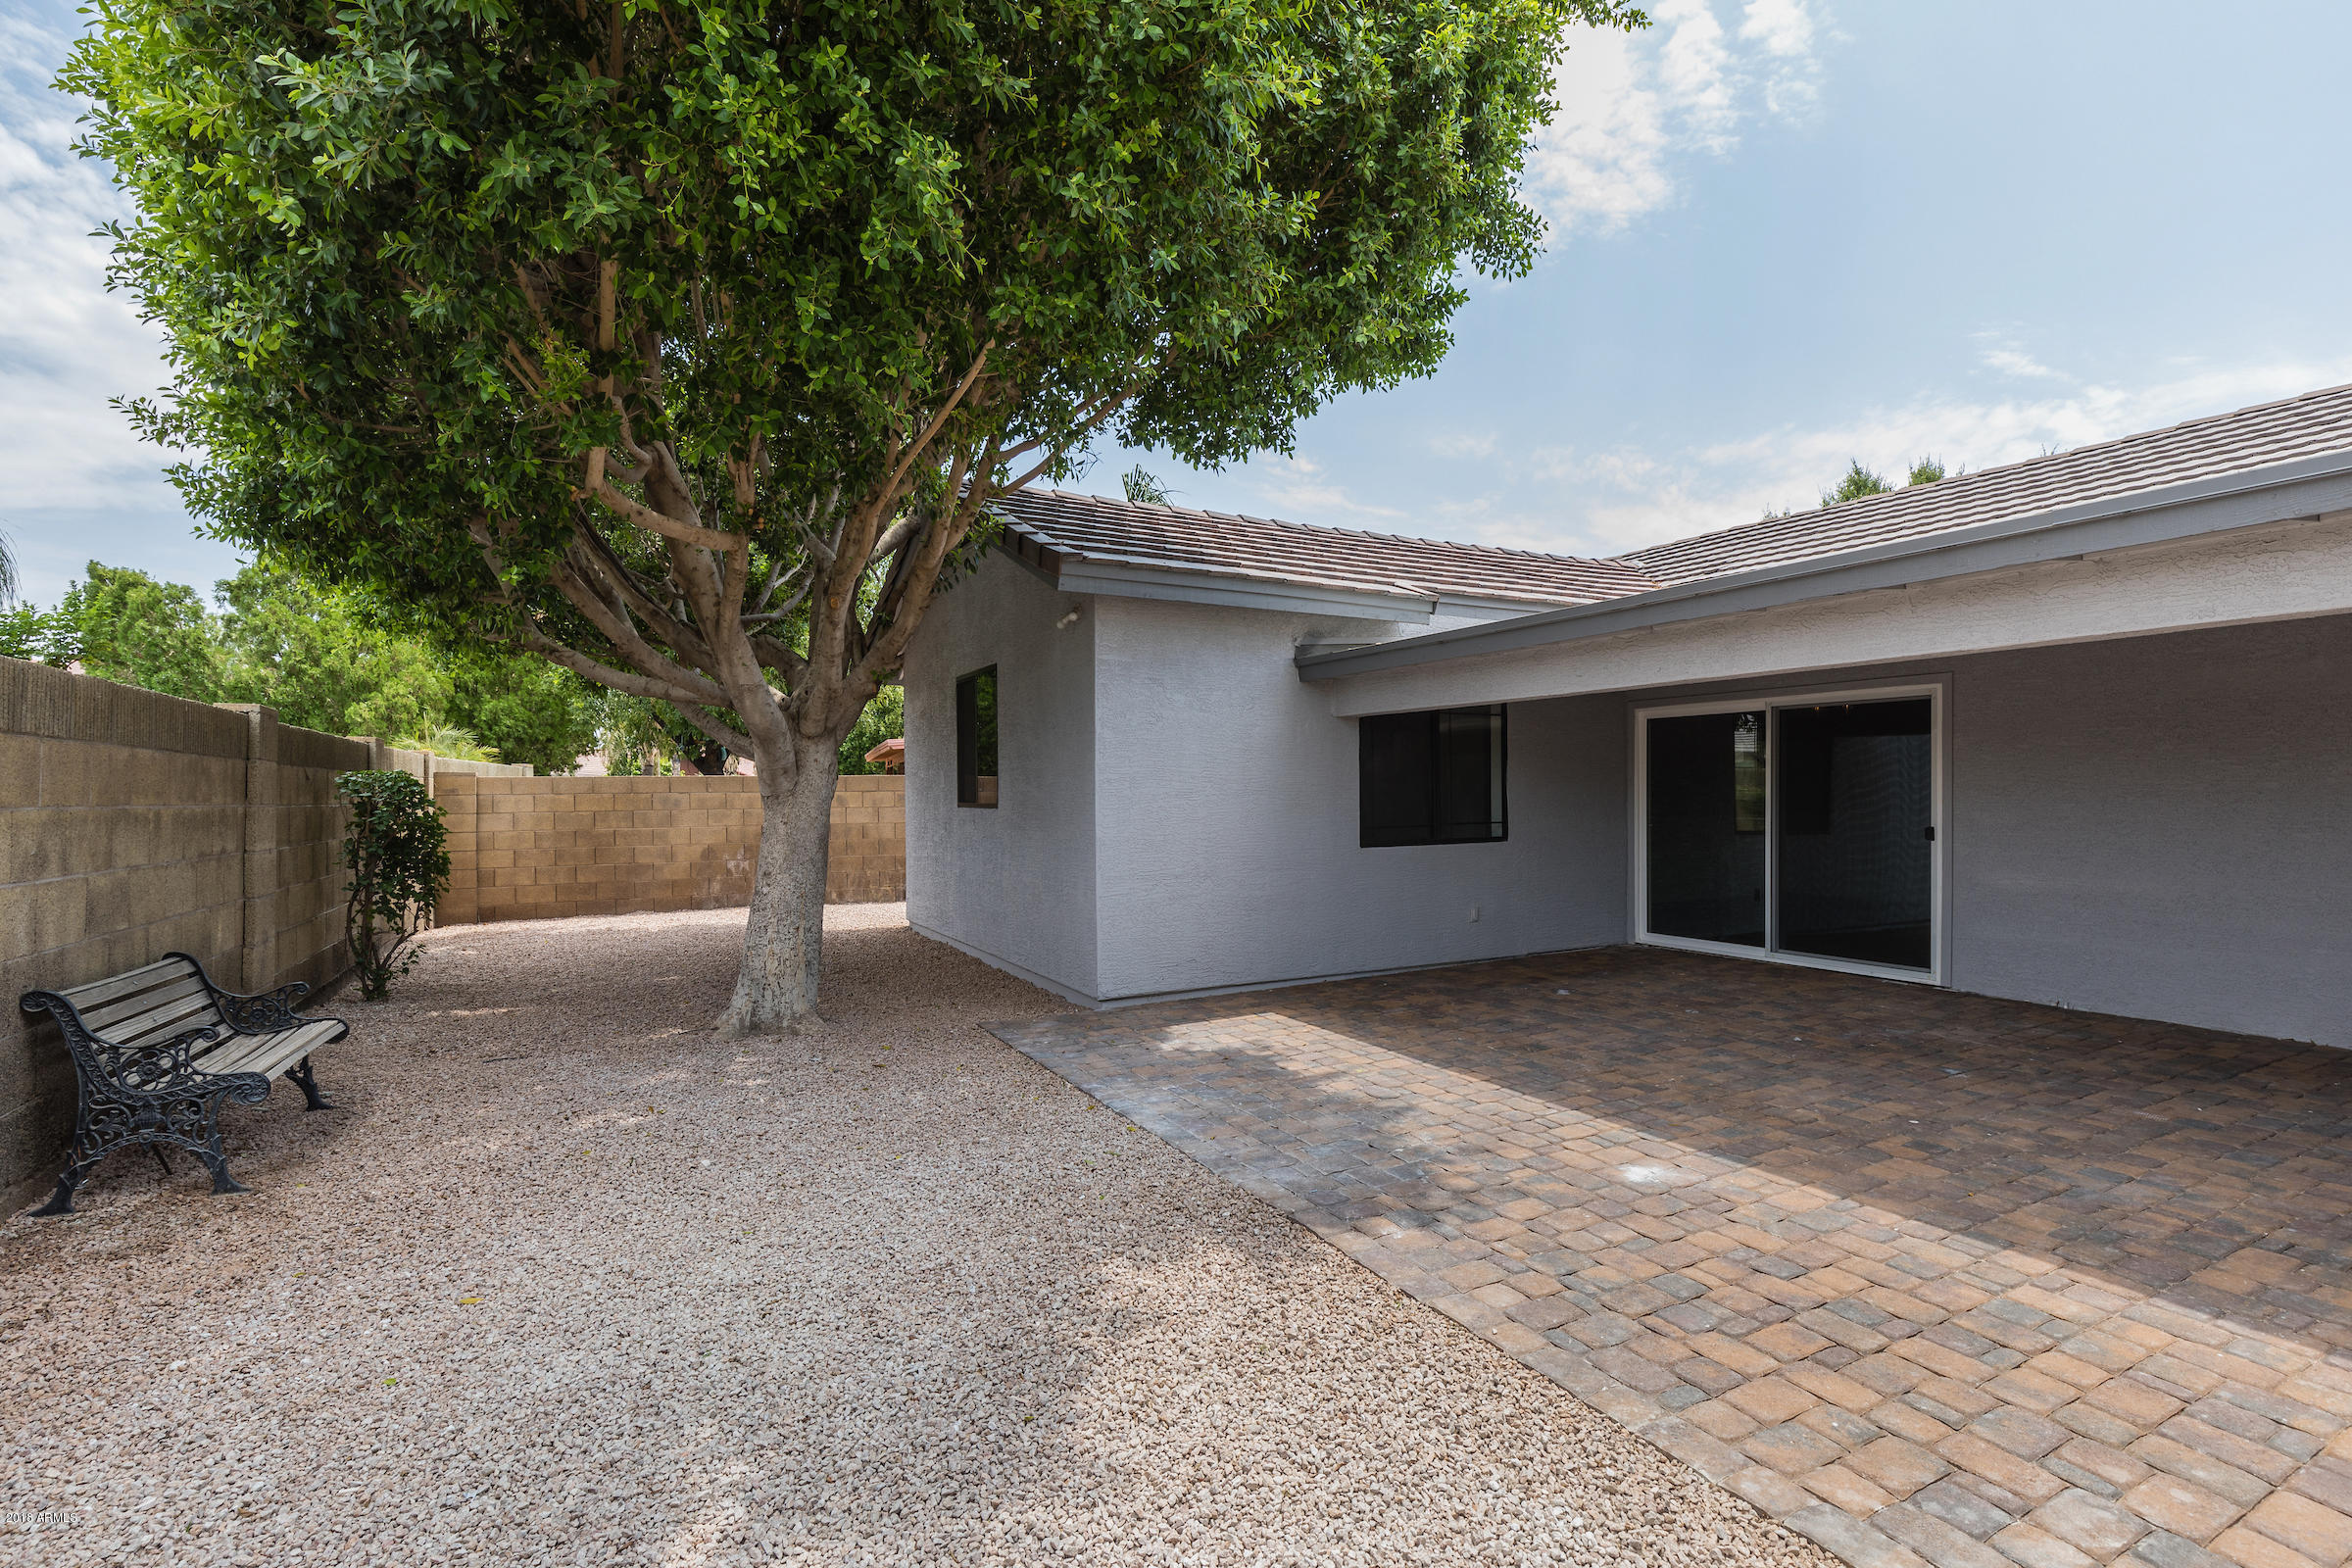 MLS 5802349 408 E MOORE Avenue, Gilbert, AZ 85234 Gilbert AZ Circle G Ranches